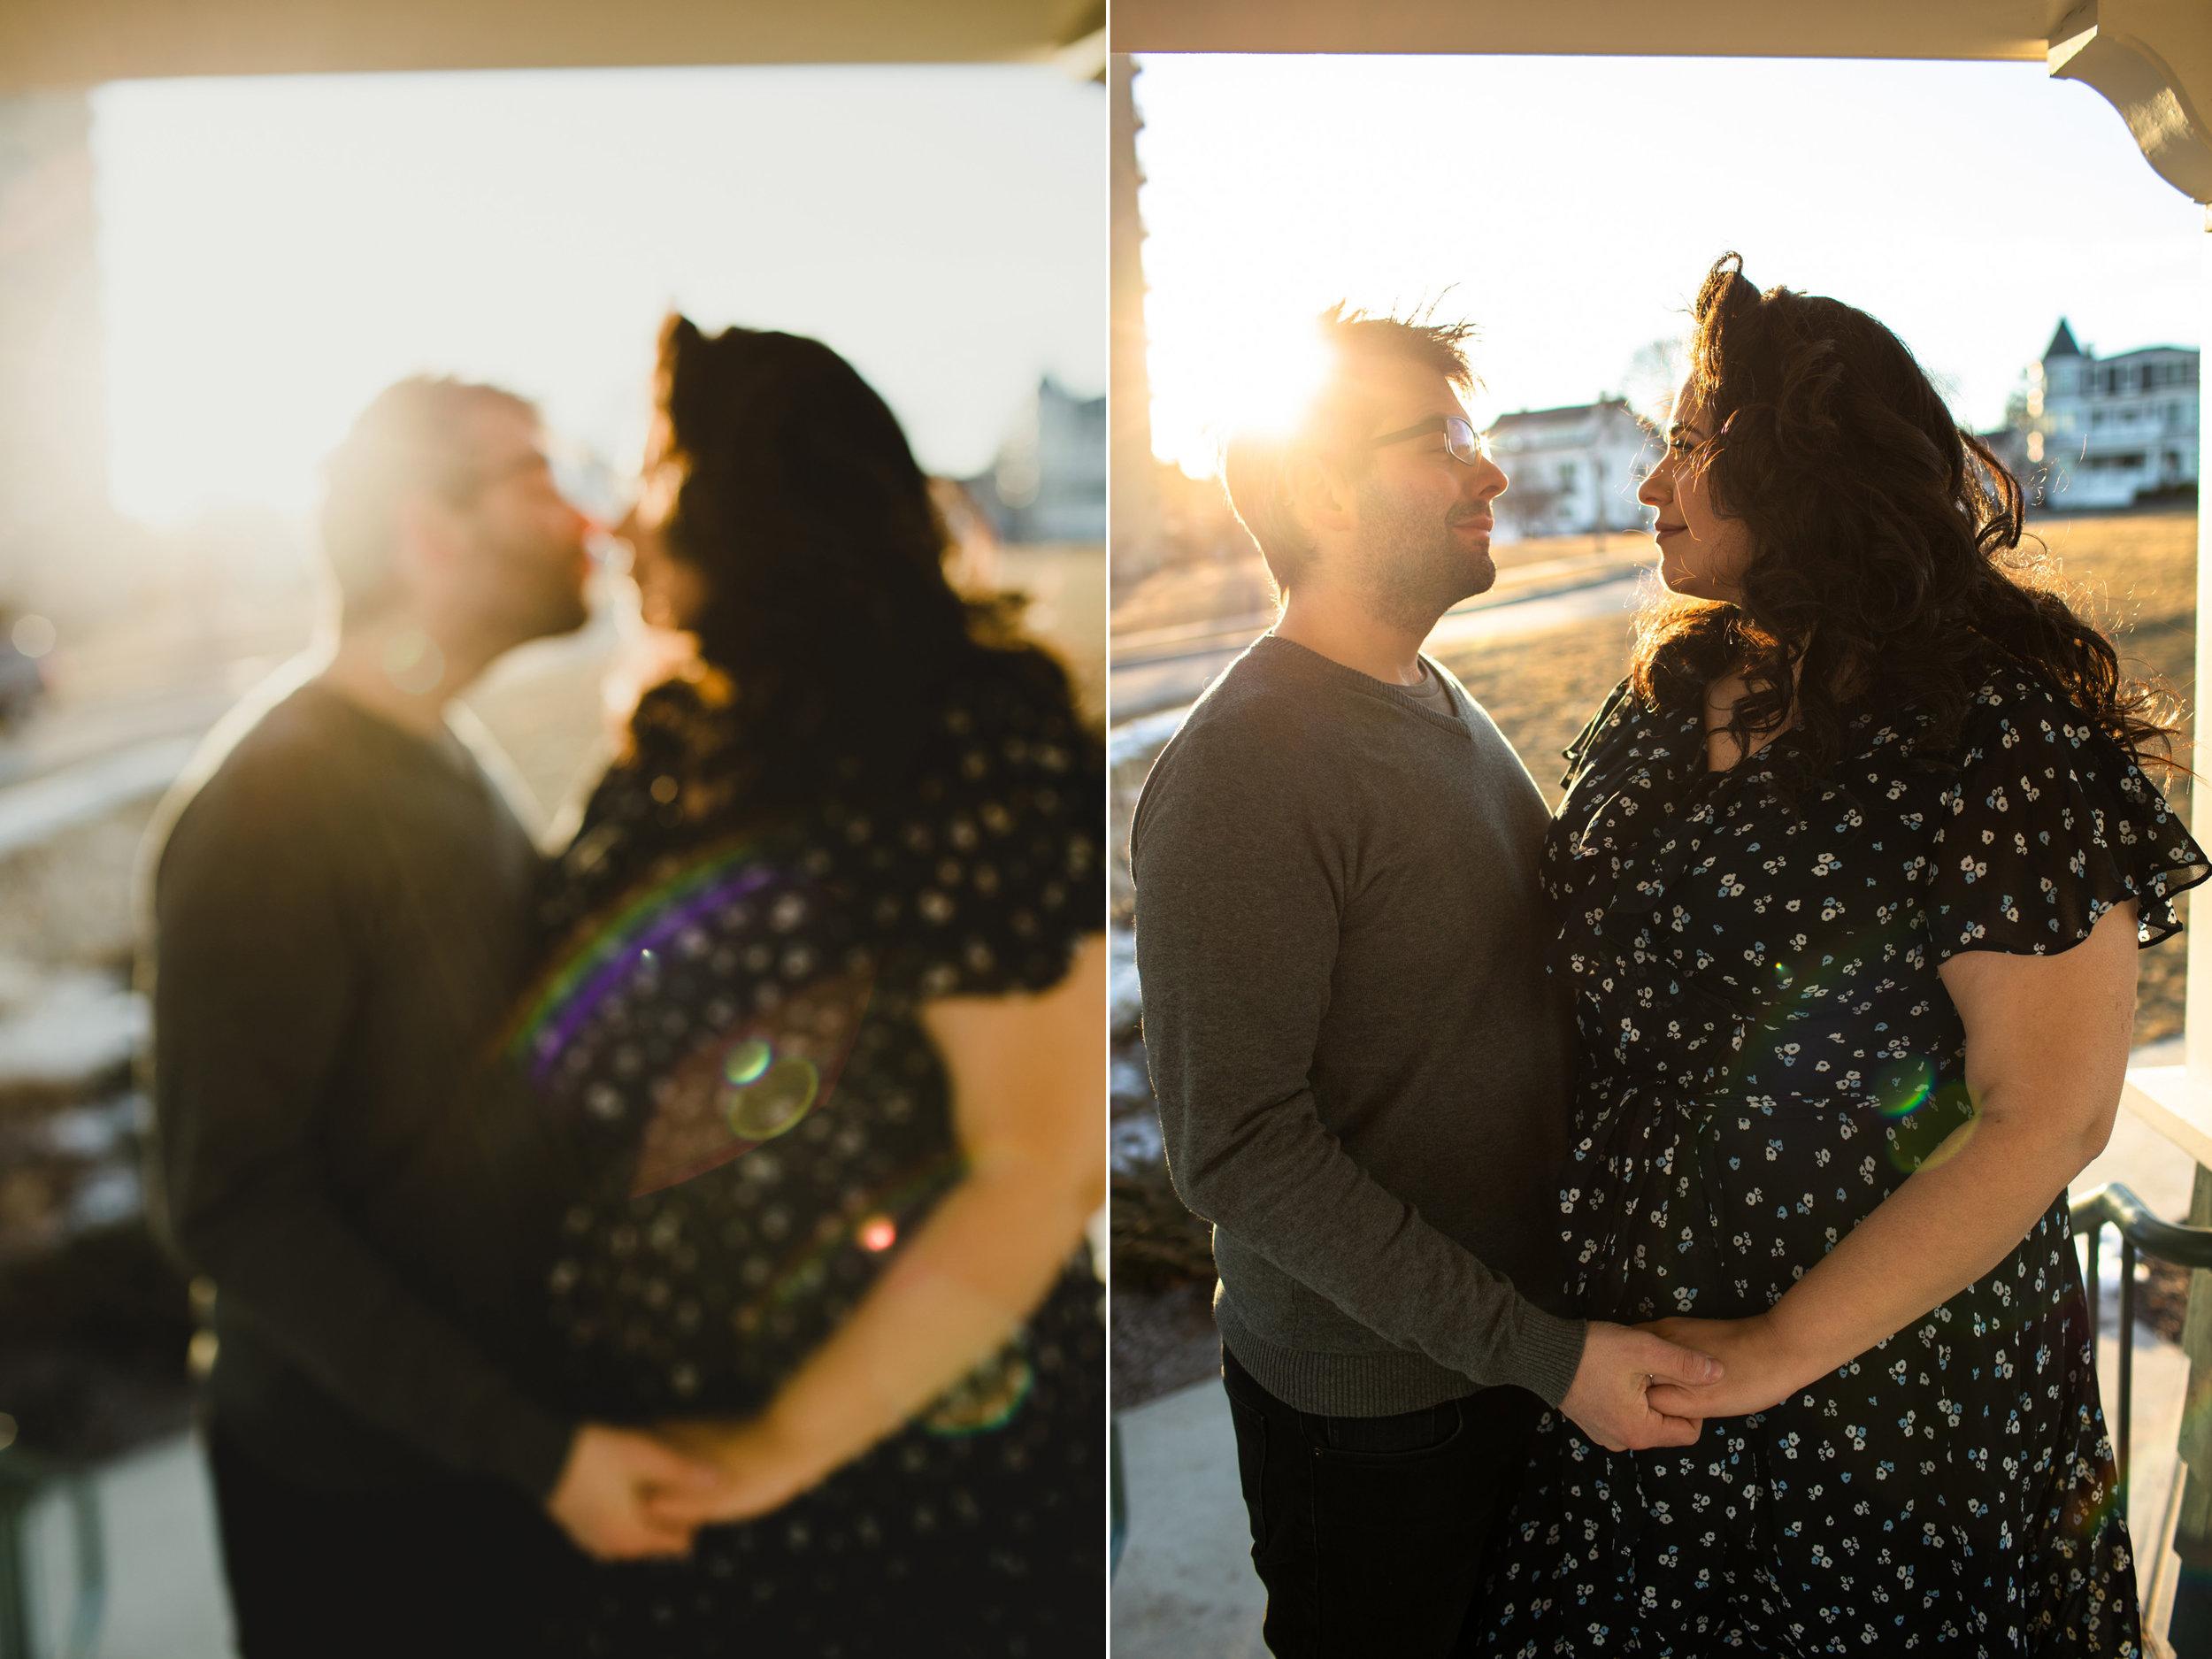 maine-wedding-photographer-engagement-session  -2b.jpg